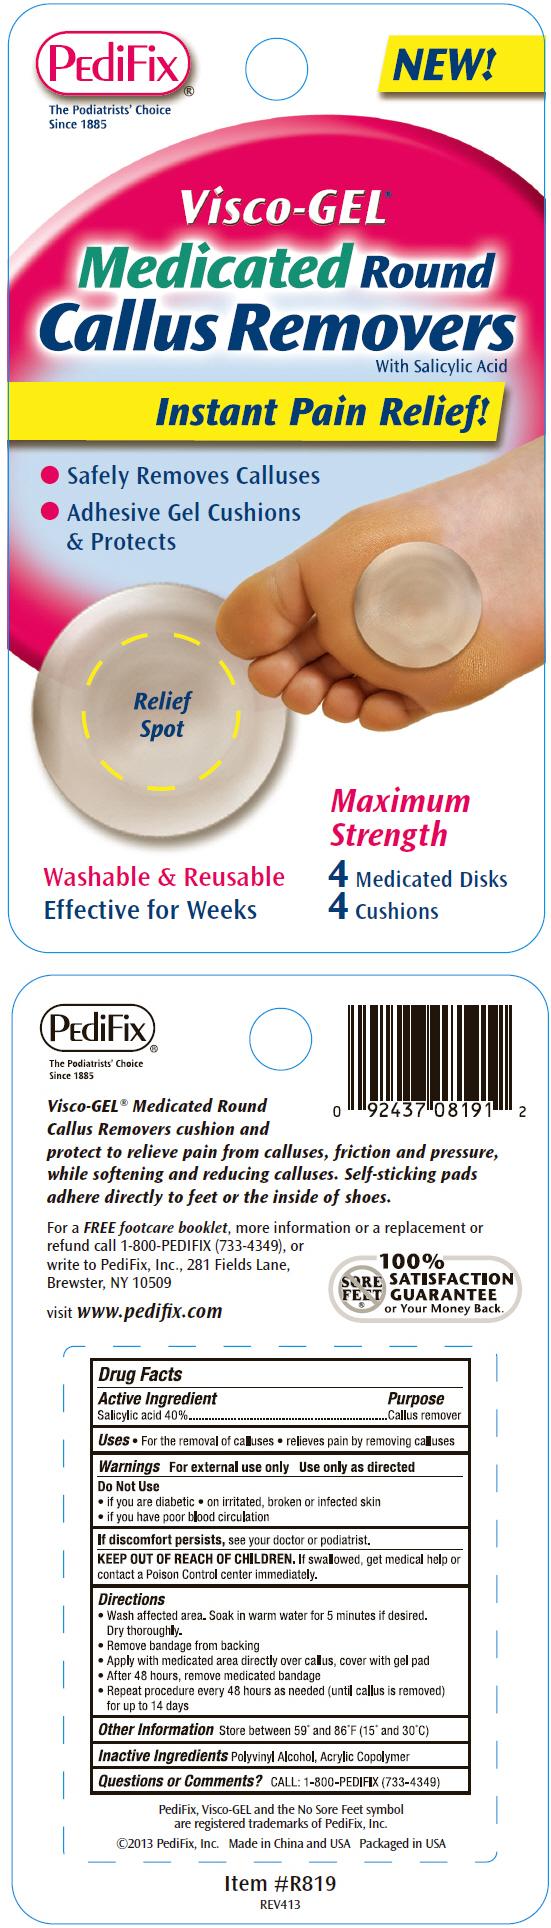 Visco-gel Medicated Round Callus Removers (Salicylic Acid) Disc [Pedifix, Inc.]